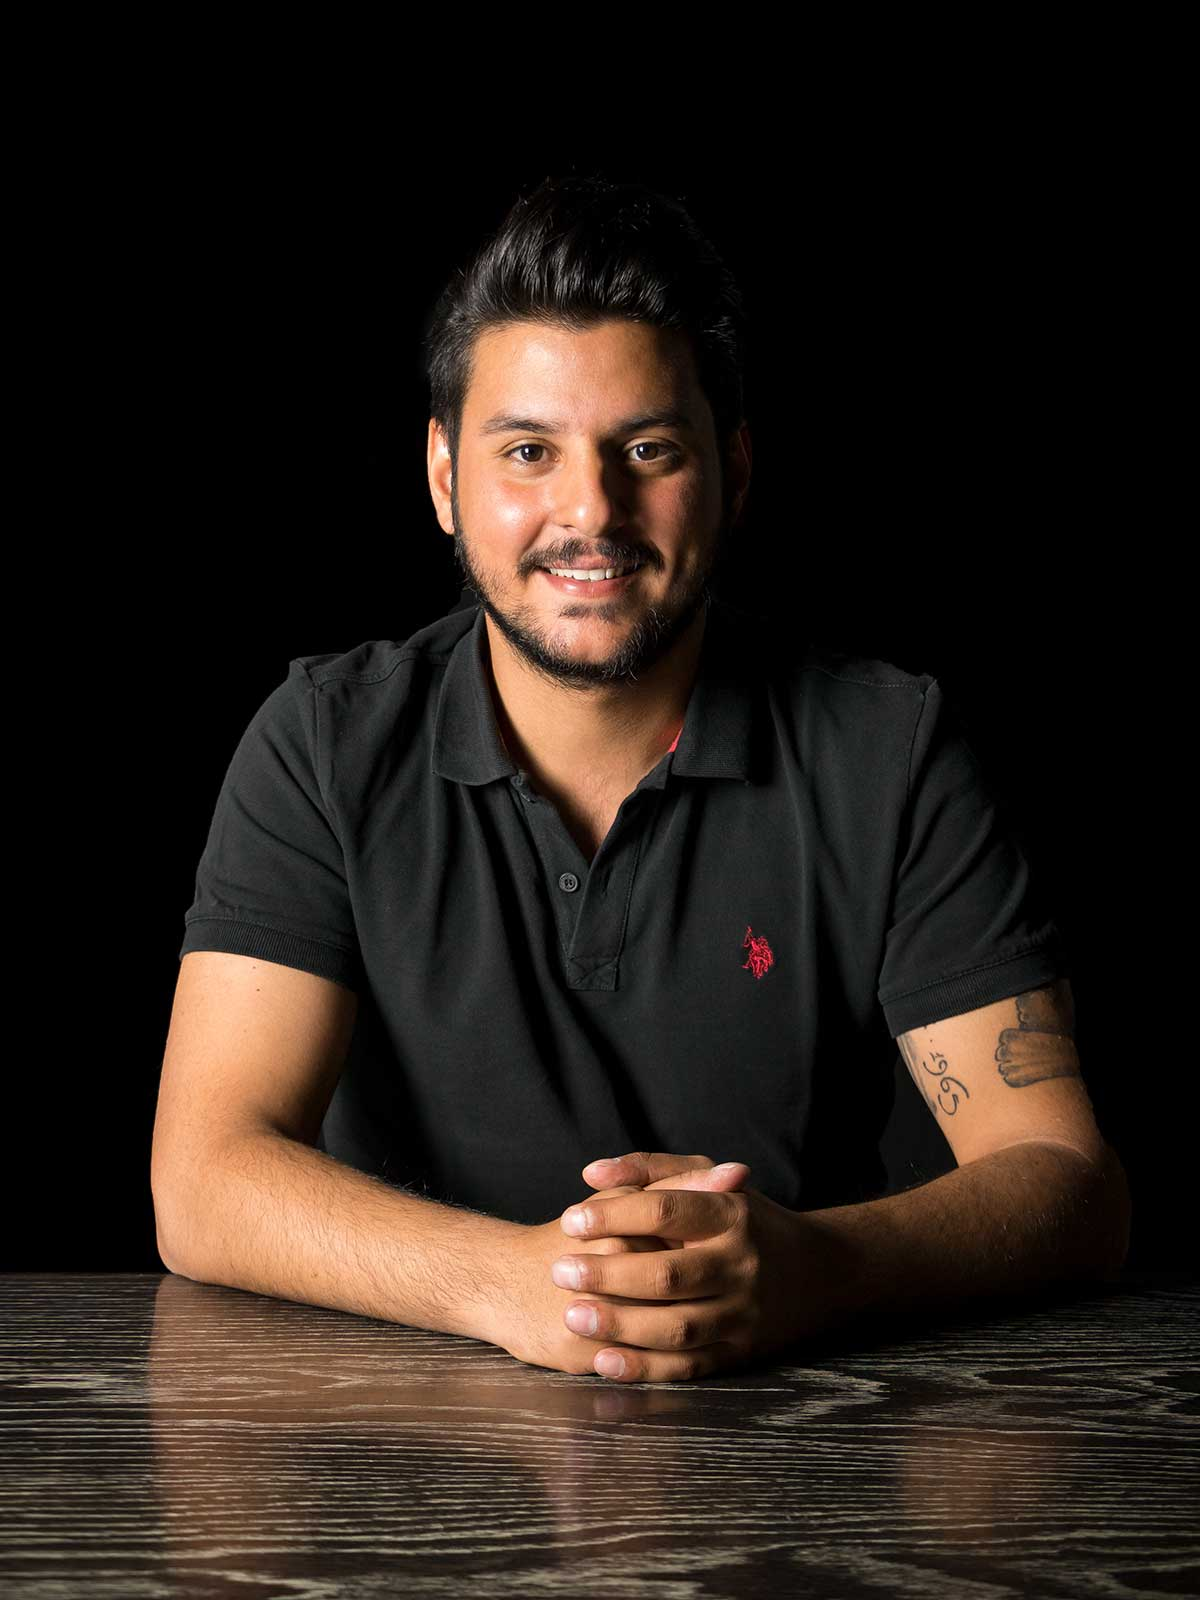 Mustafa Sepik, verlegerservice, leserservice, avd goldach ag